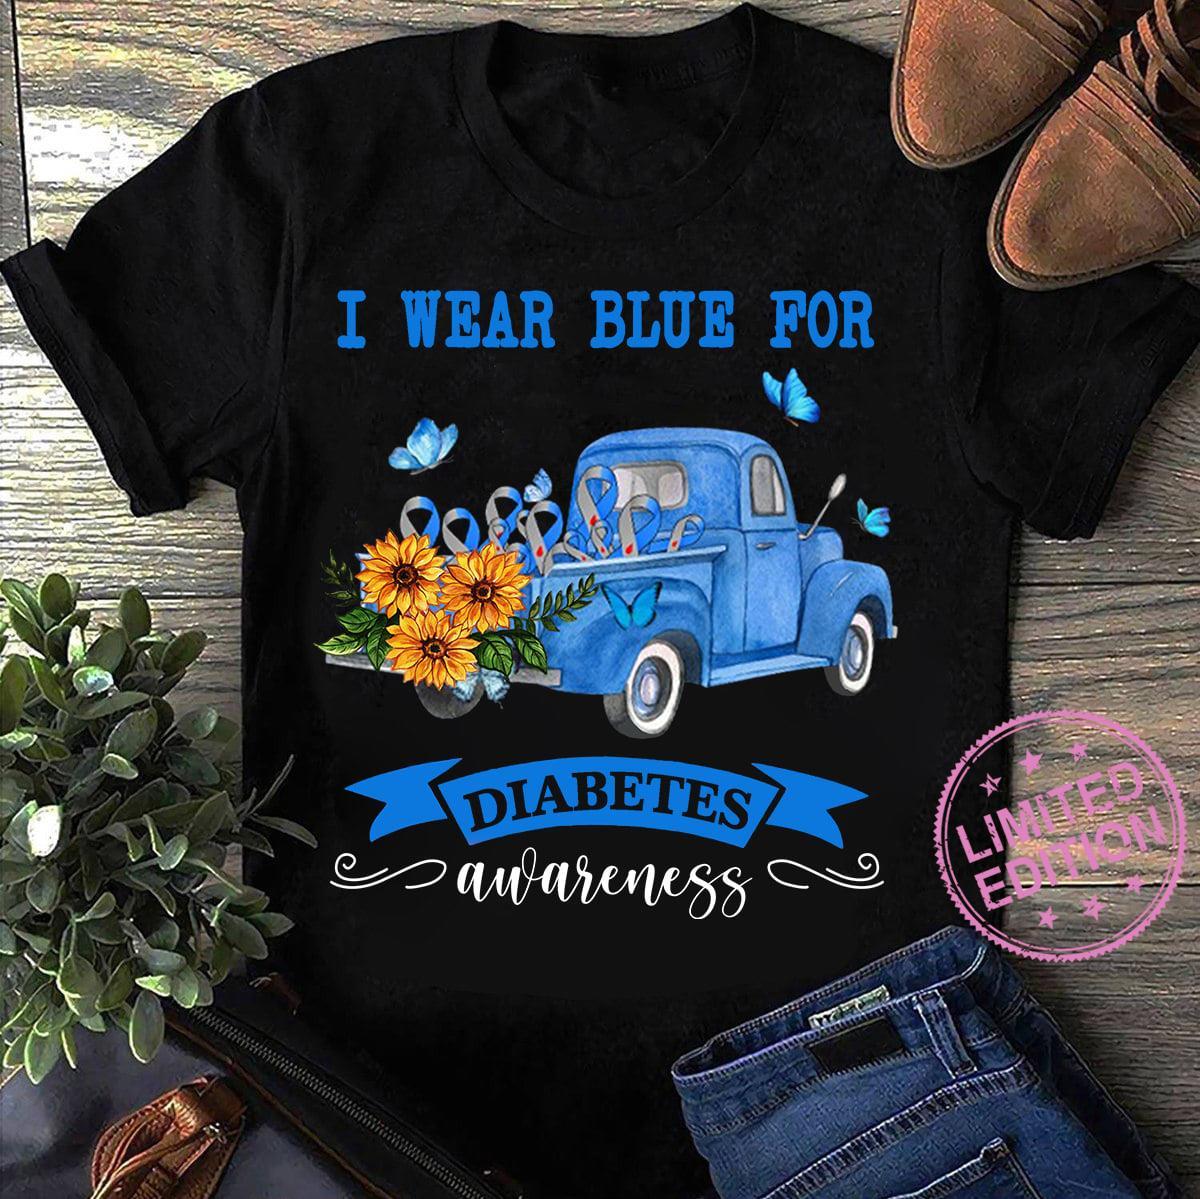 I wear blue for diabetes awareness shirt